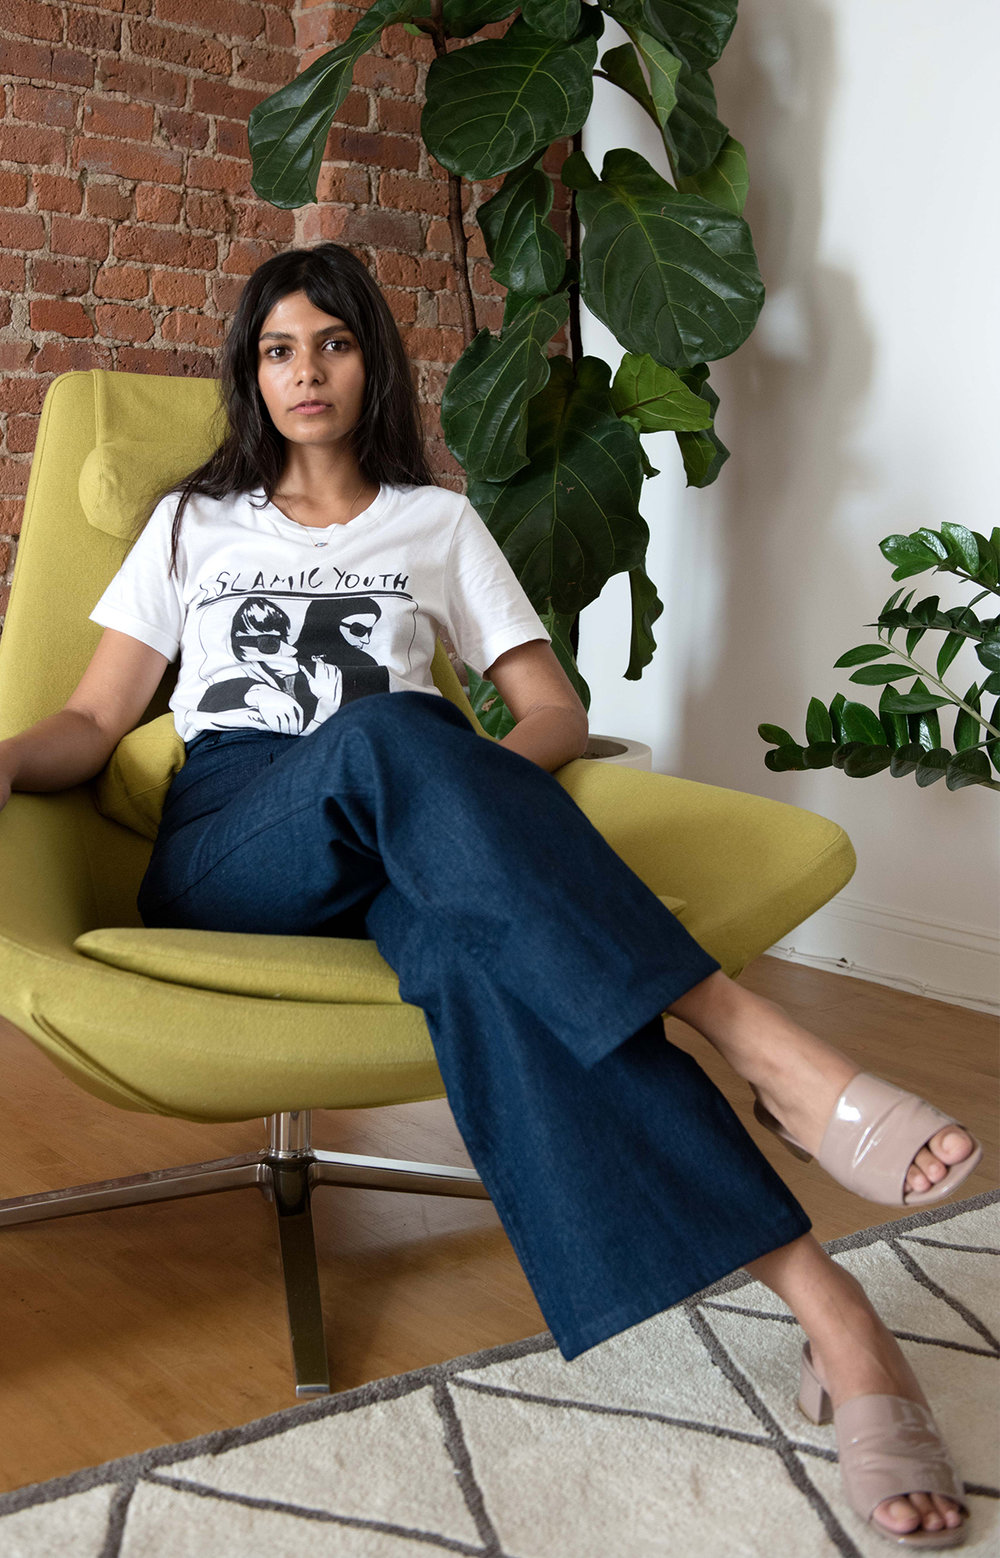 Tasnim-Ahmed-Lisa-Says-Gah-Interview-Lead-Image-01